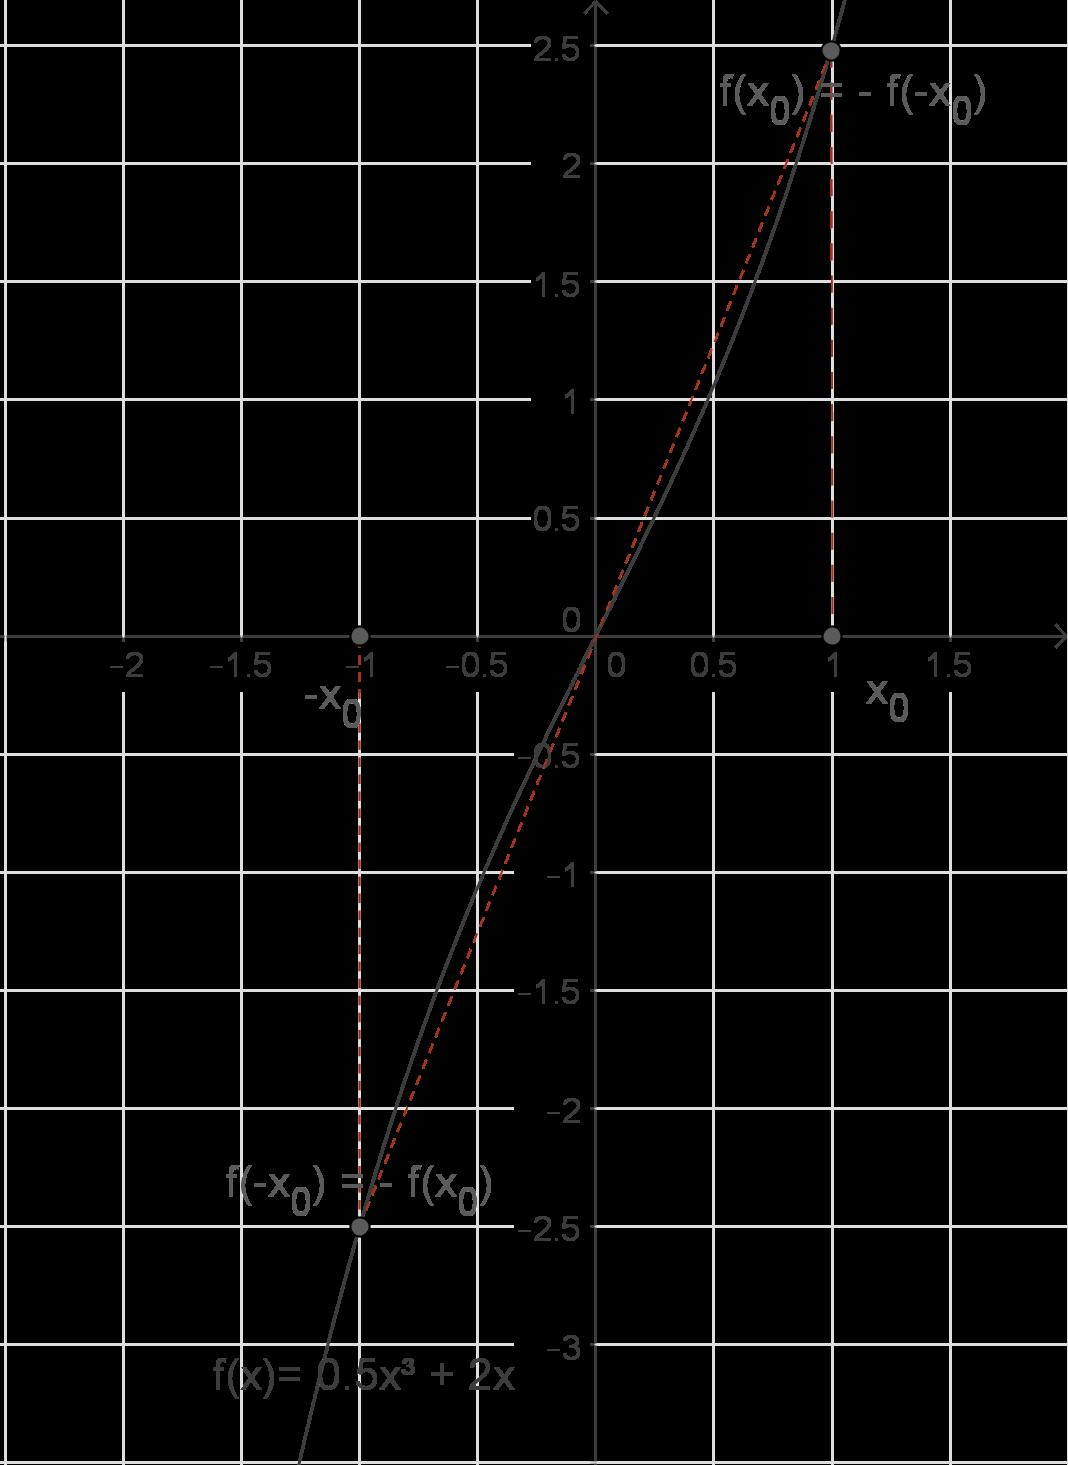 Ganzrationale Funktionen: Symmetrie